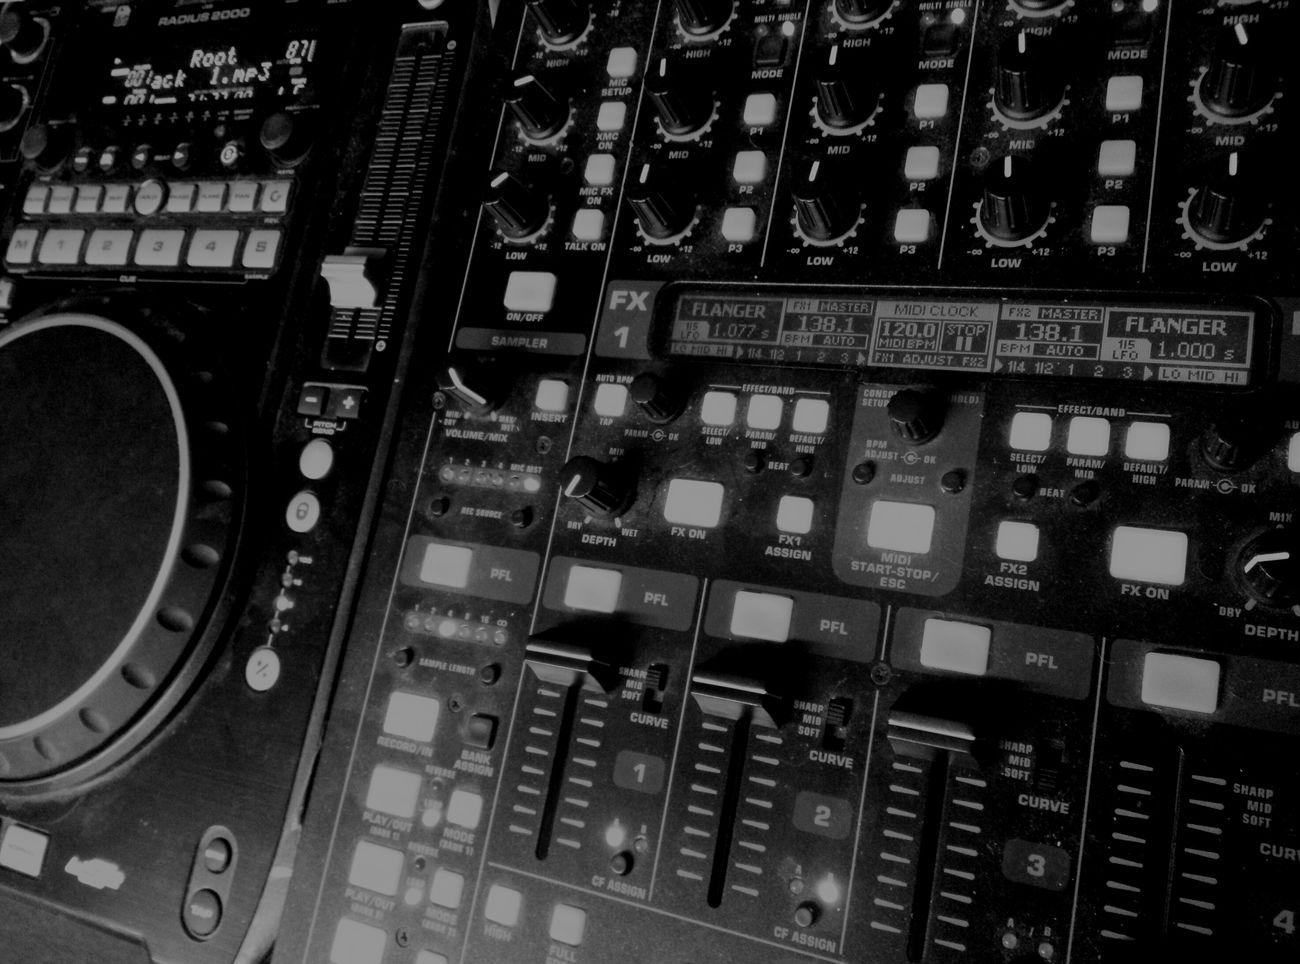 Party bei Rautemusik.FM @DJ Torsten Dee (Torsten78) Dj Ludwigshafen Talking Photos